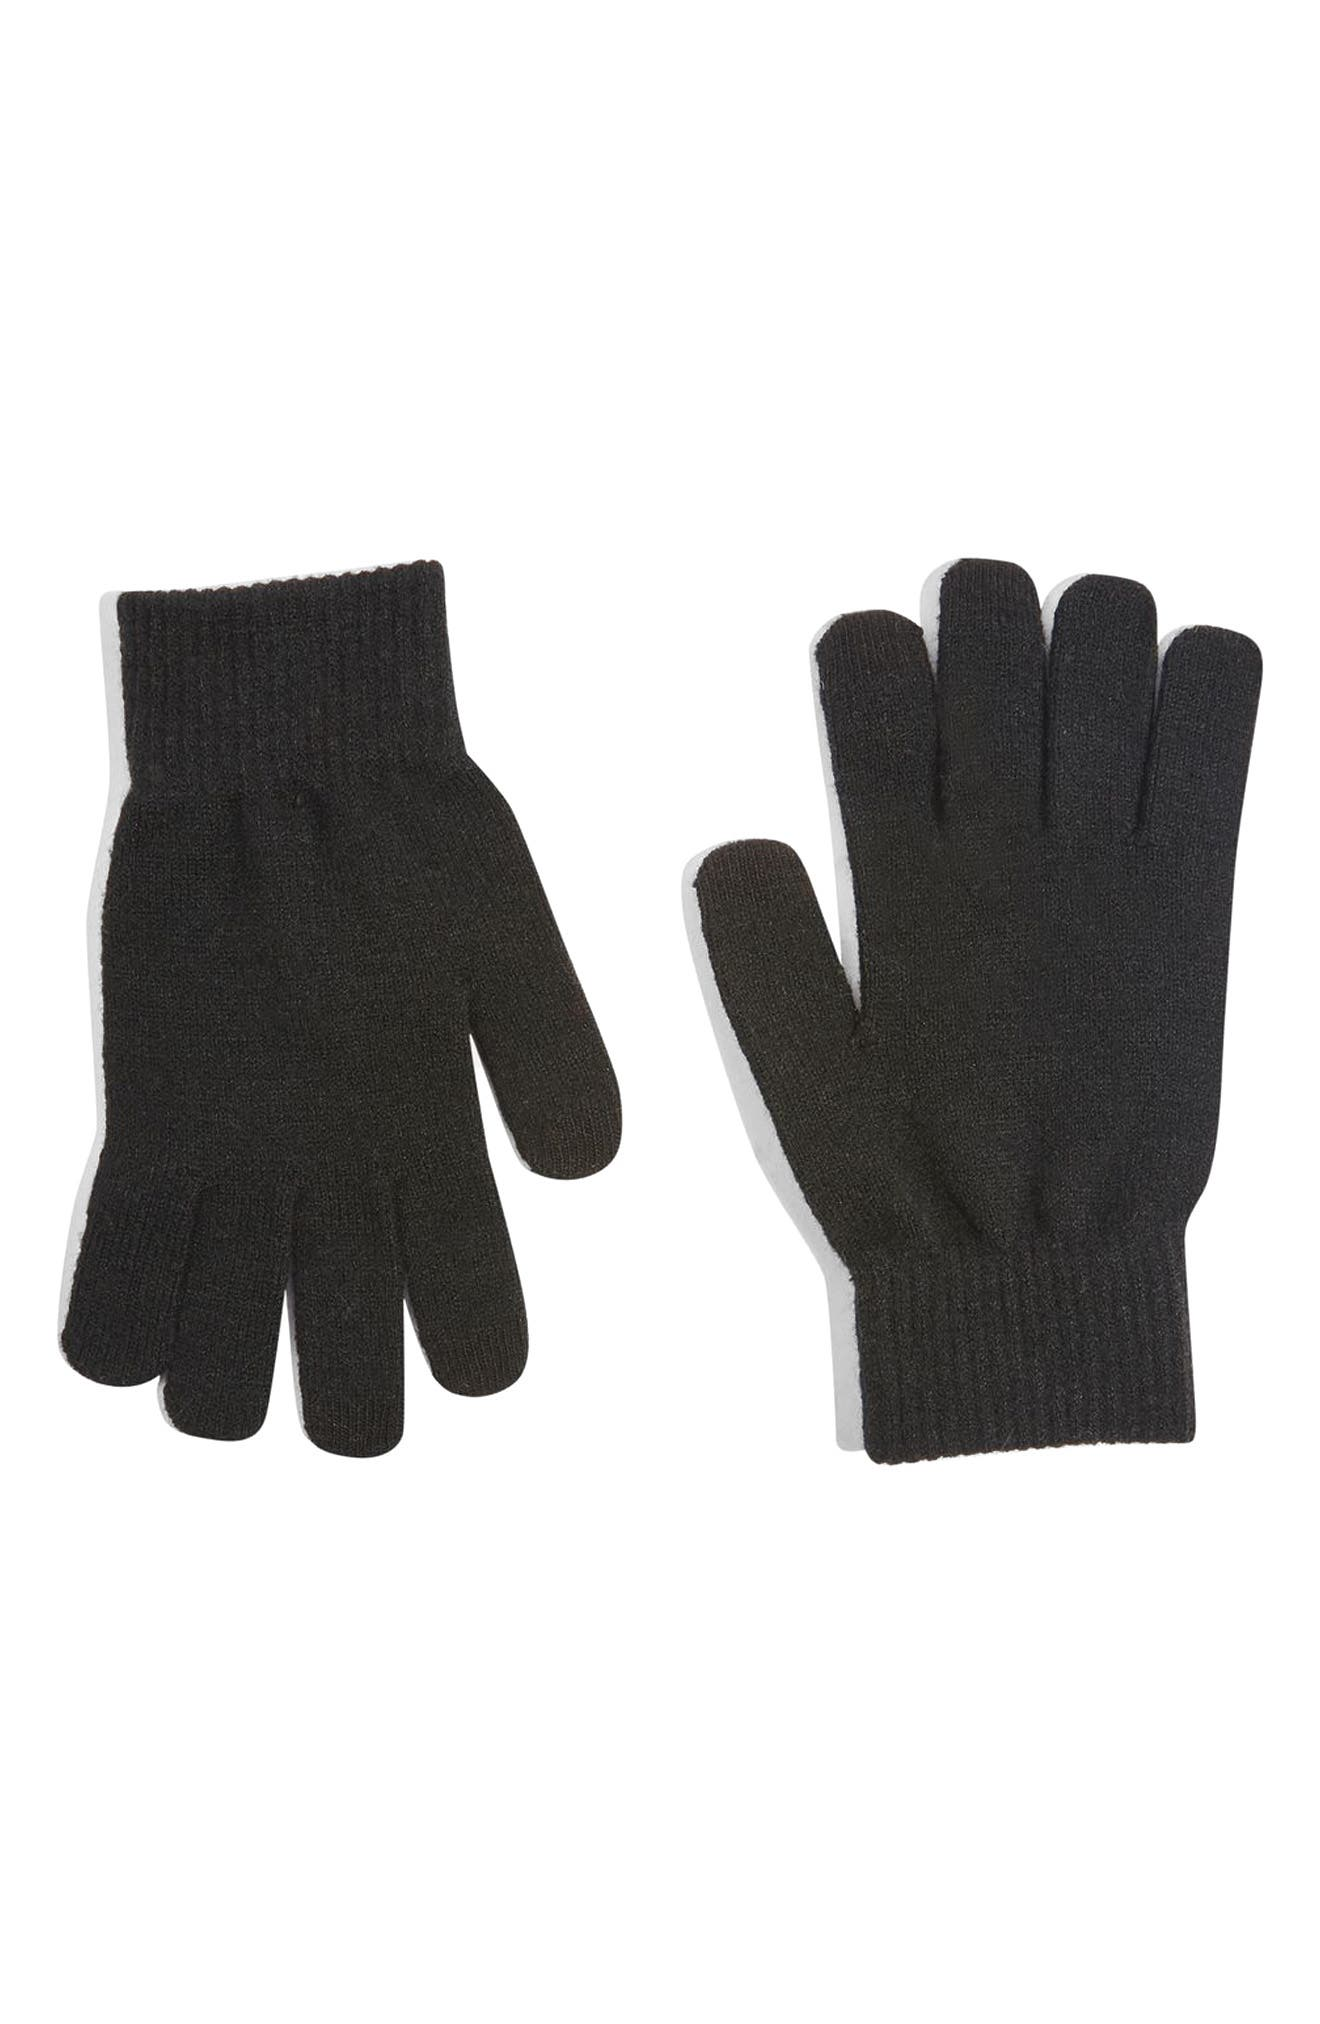 Core Winter Tech Gloves,                         Main,                         color, 001